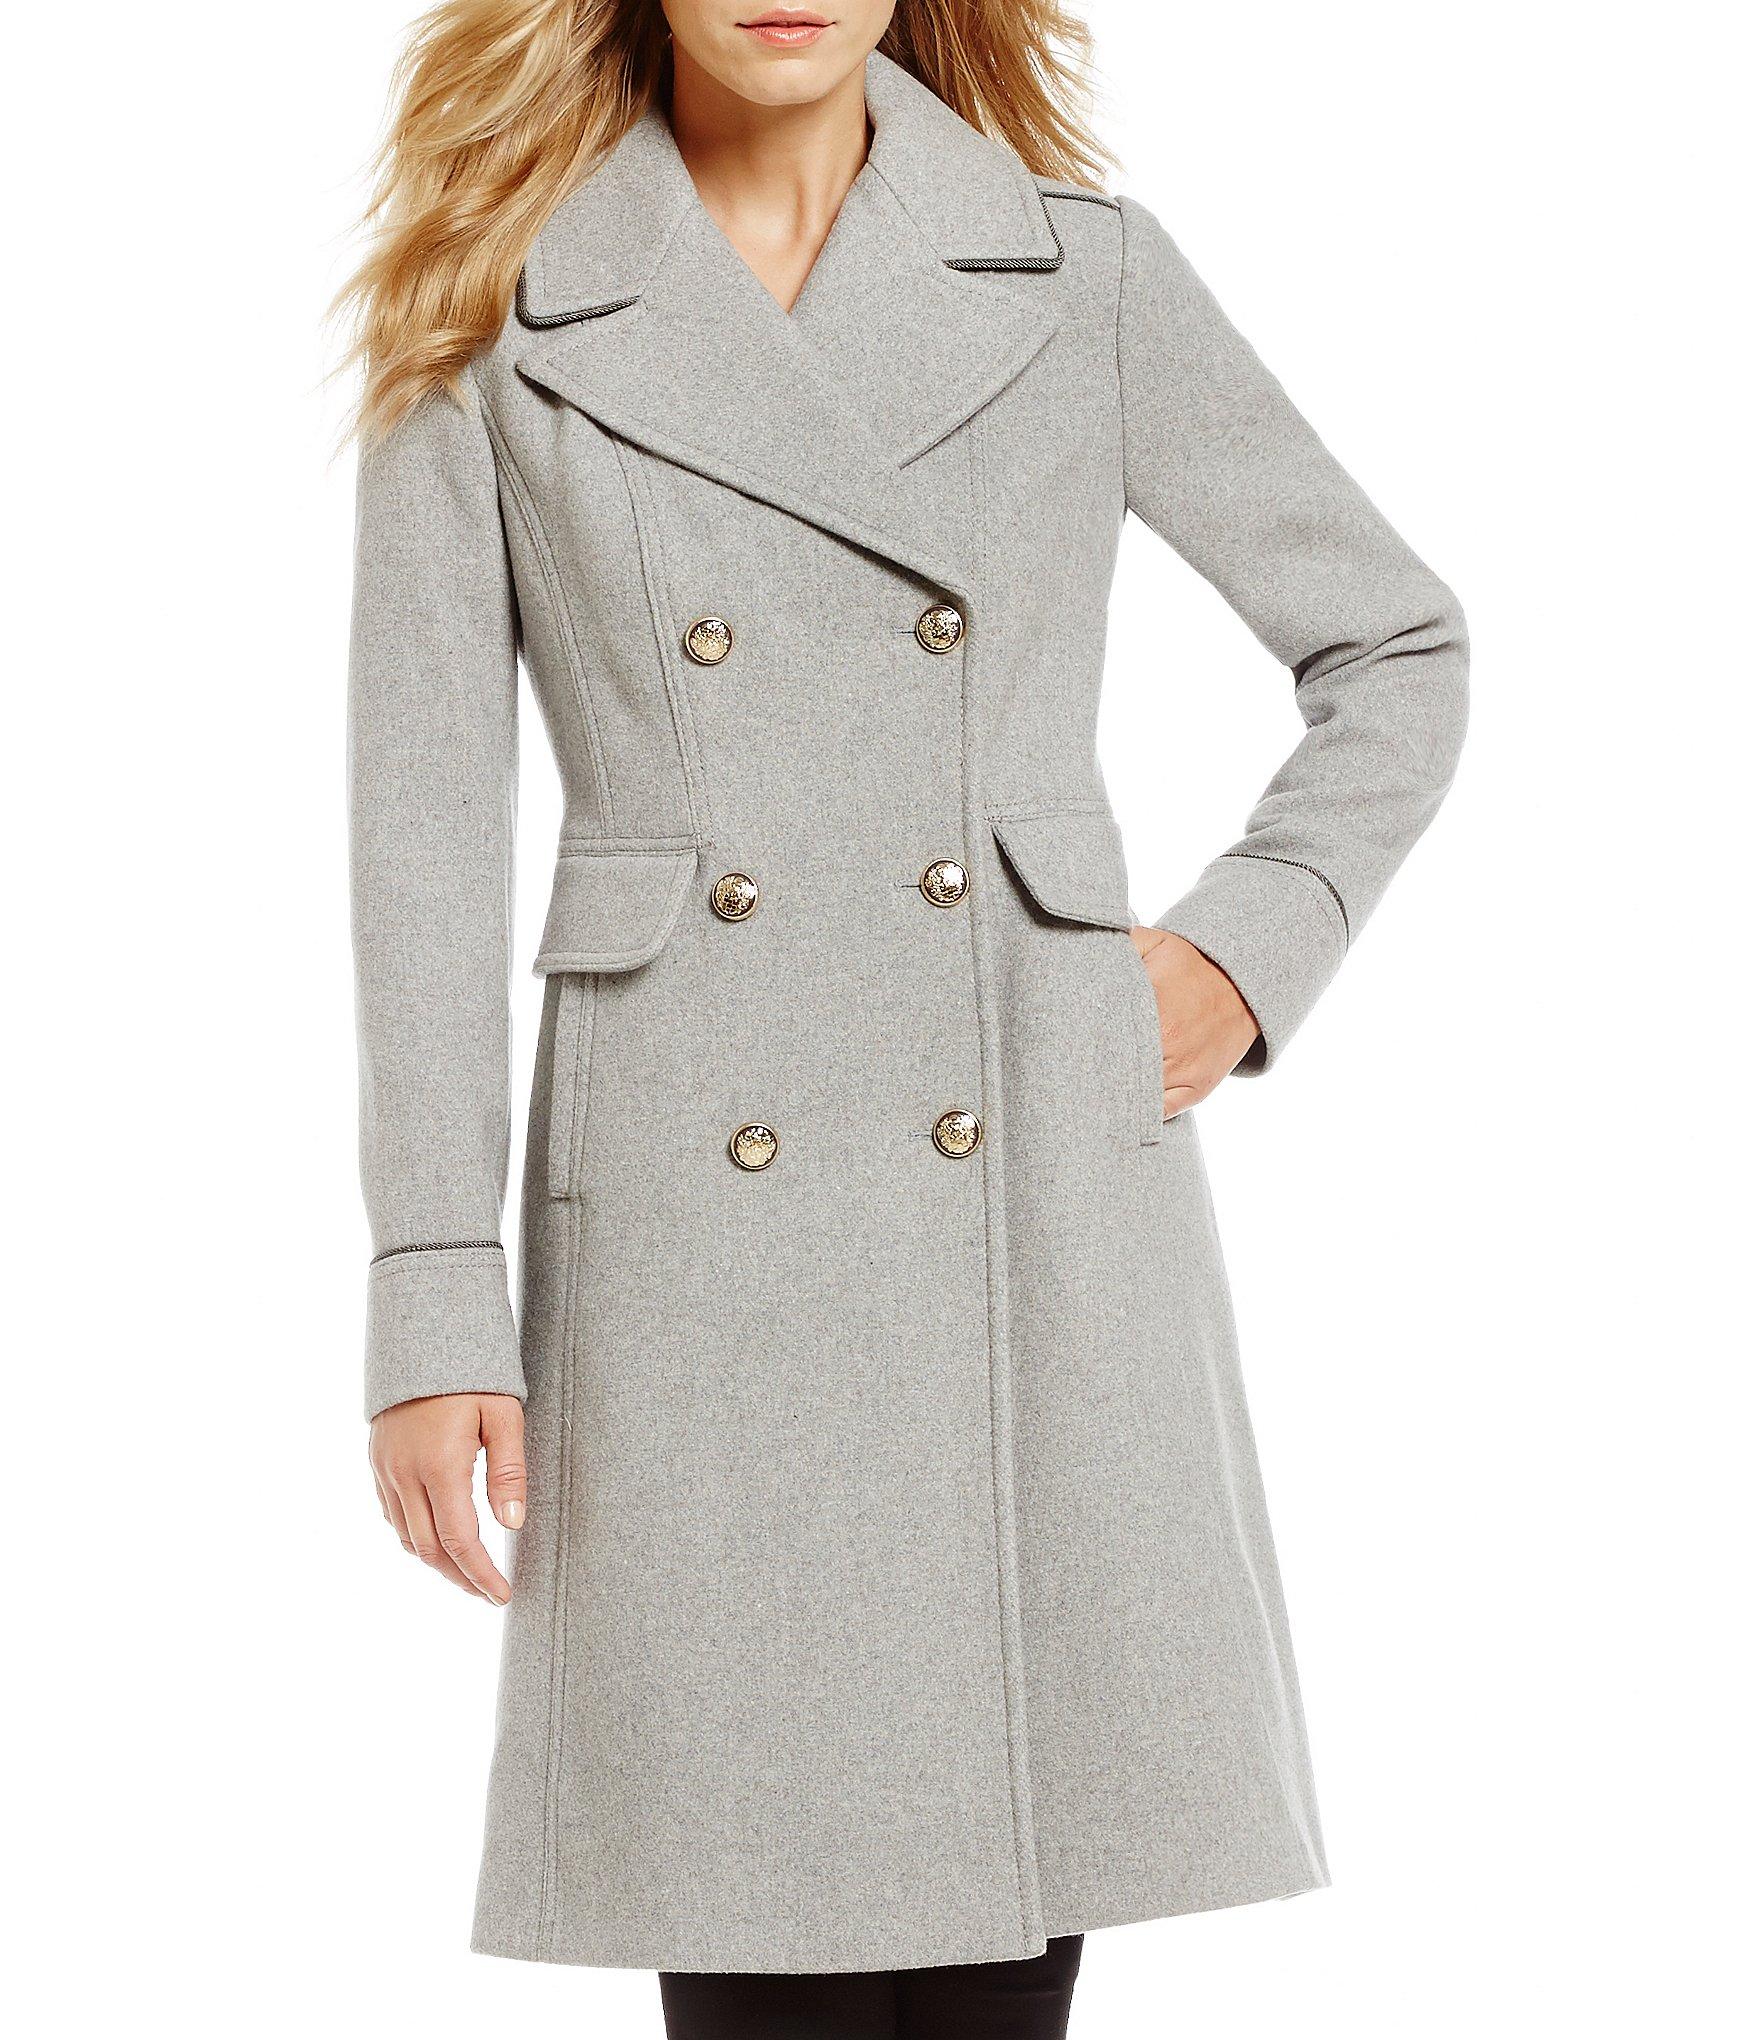 wool coat dimg.dillards.com/is/image/dillardszoom/zoom/vince... lohhumy